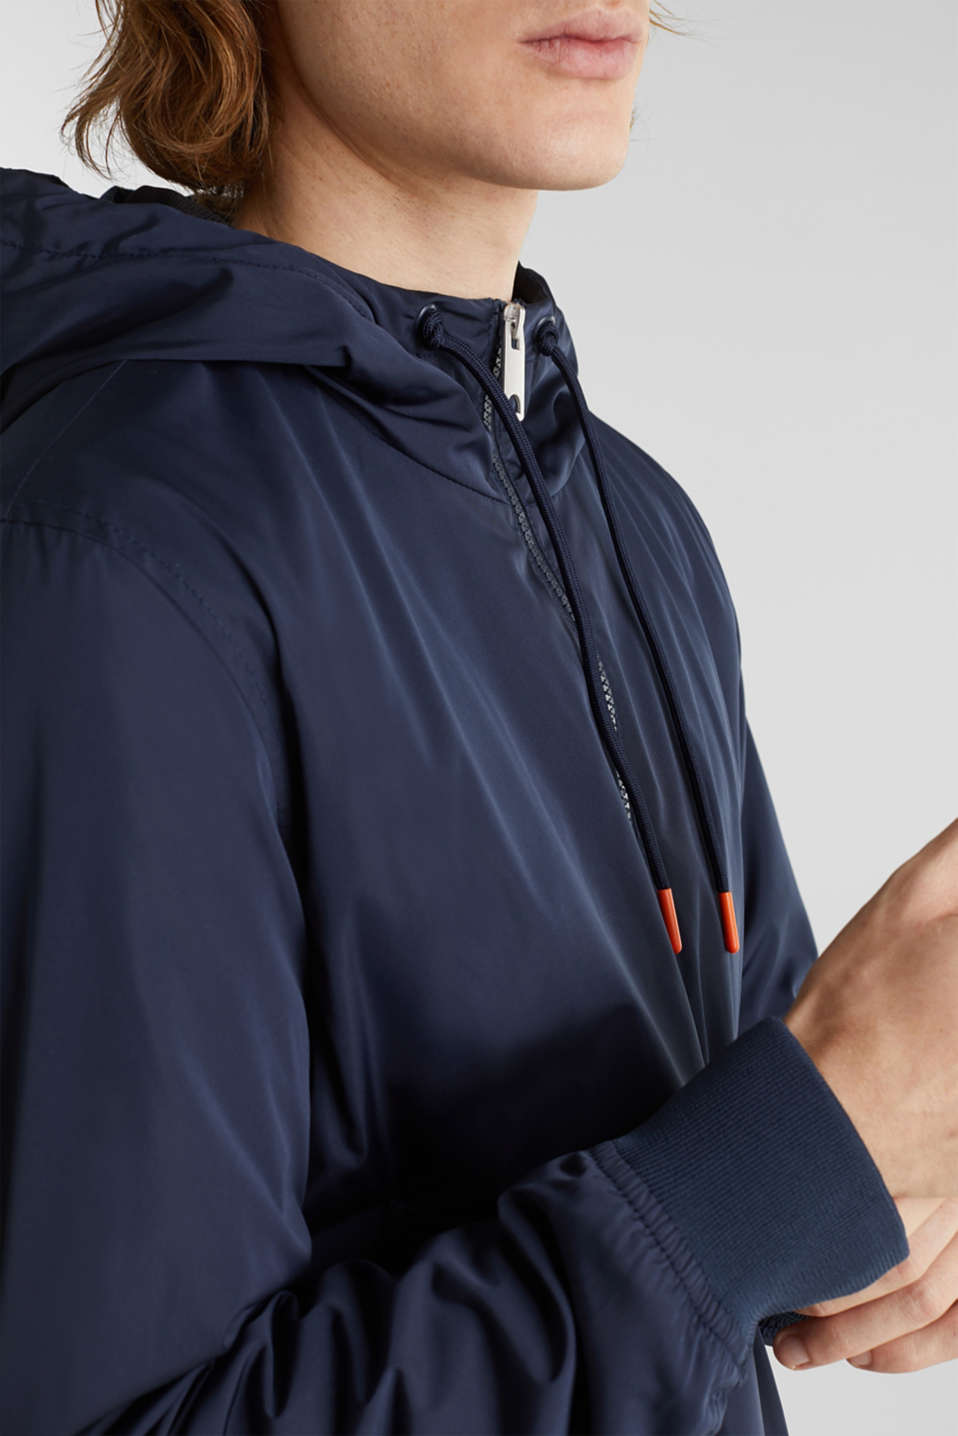 Nylon bomber jacket with a hood, DARK BLUE, detail image number 6